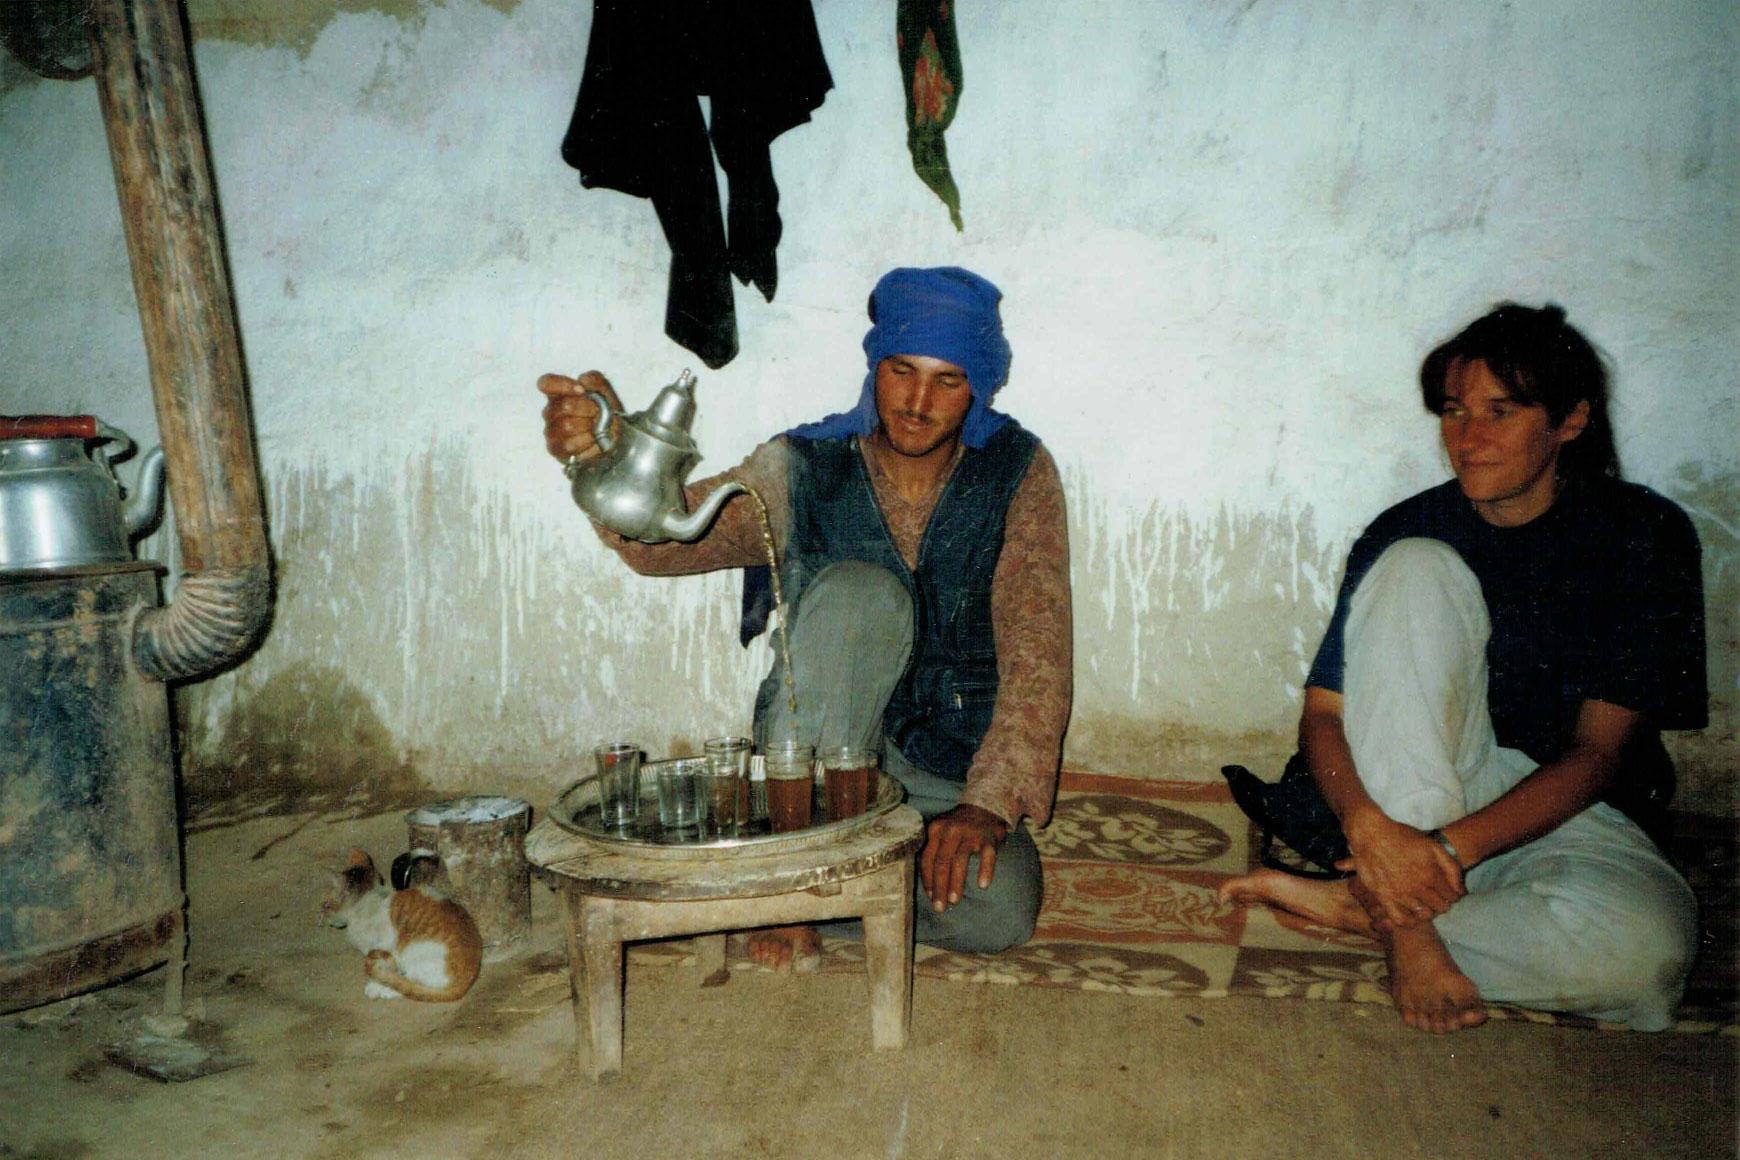 Tee bei Freunden in Marokko